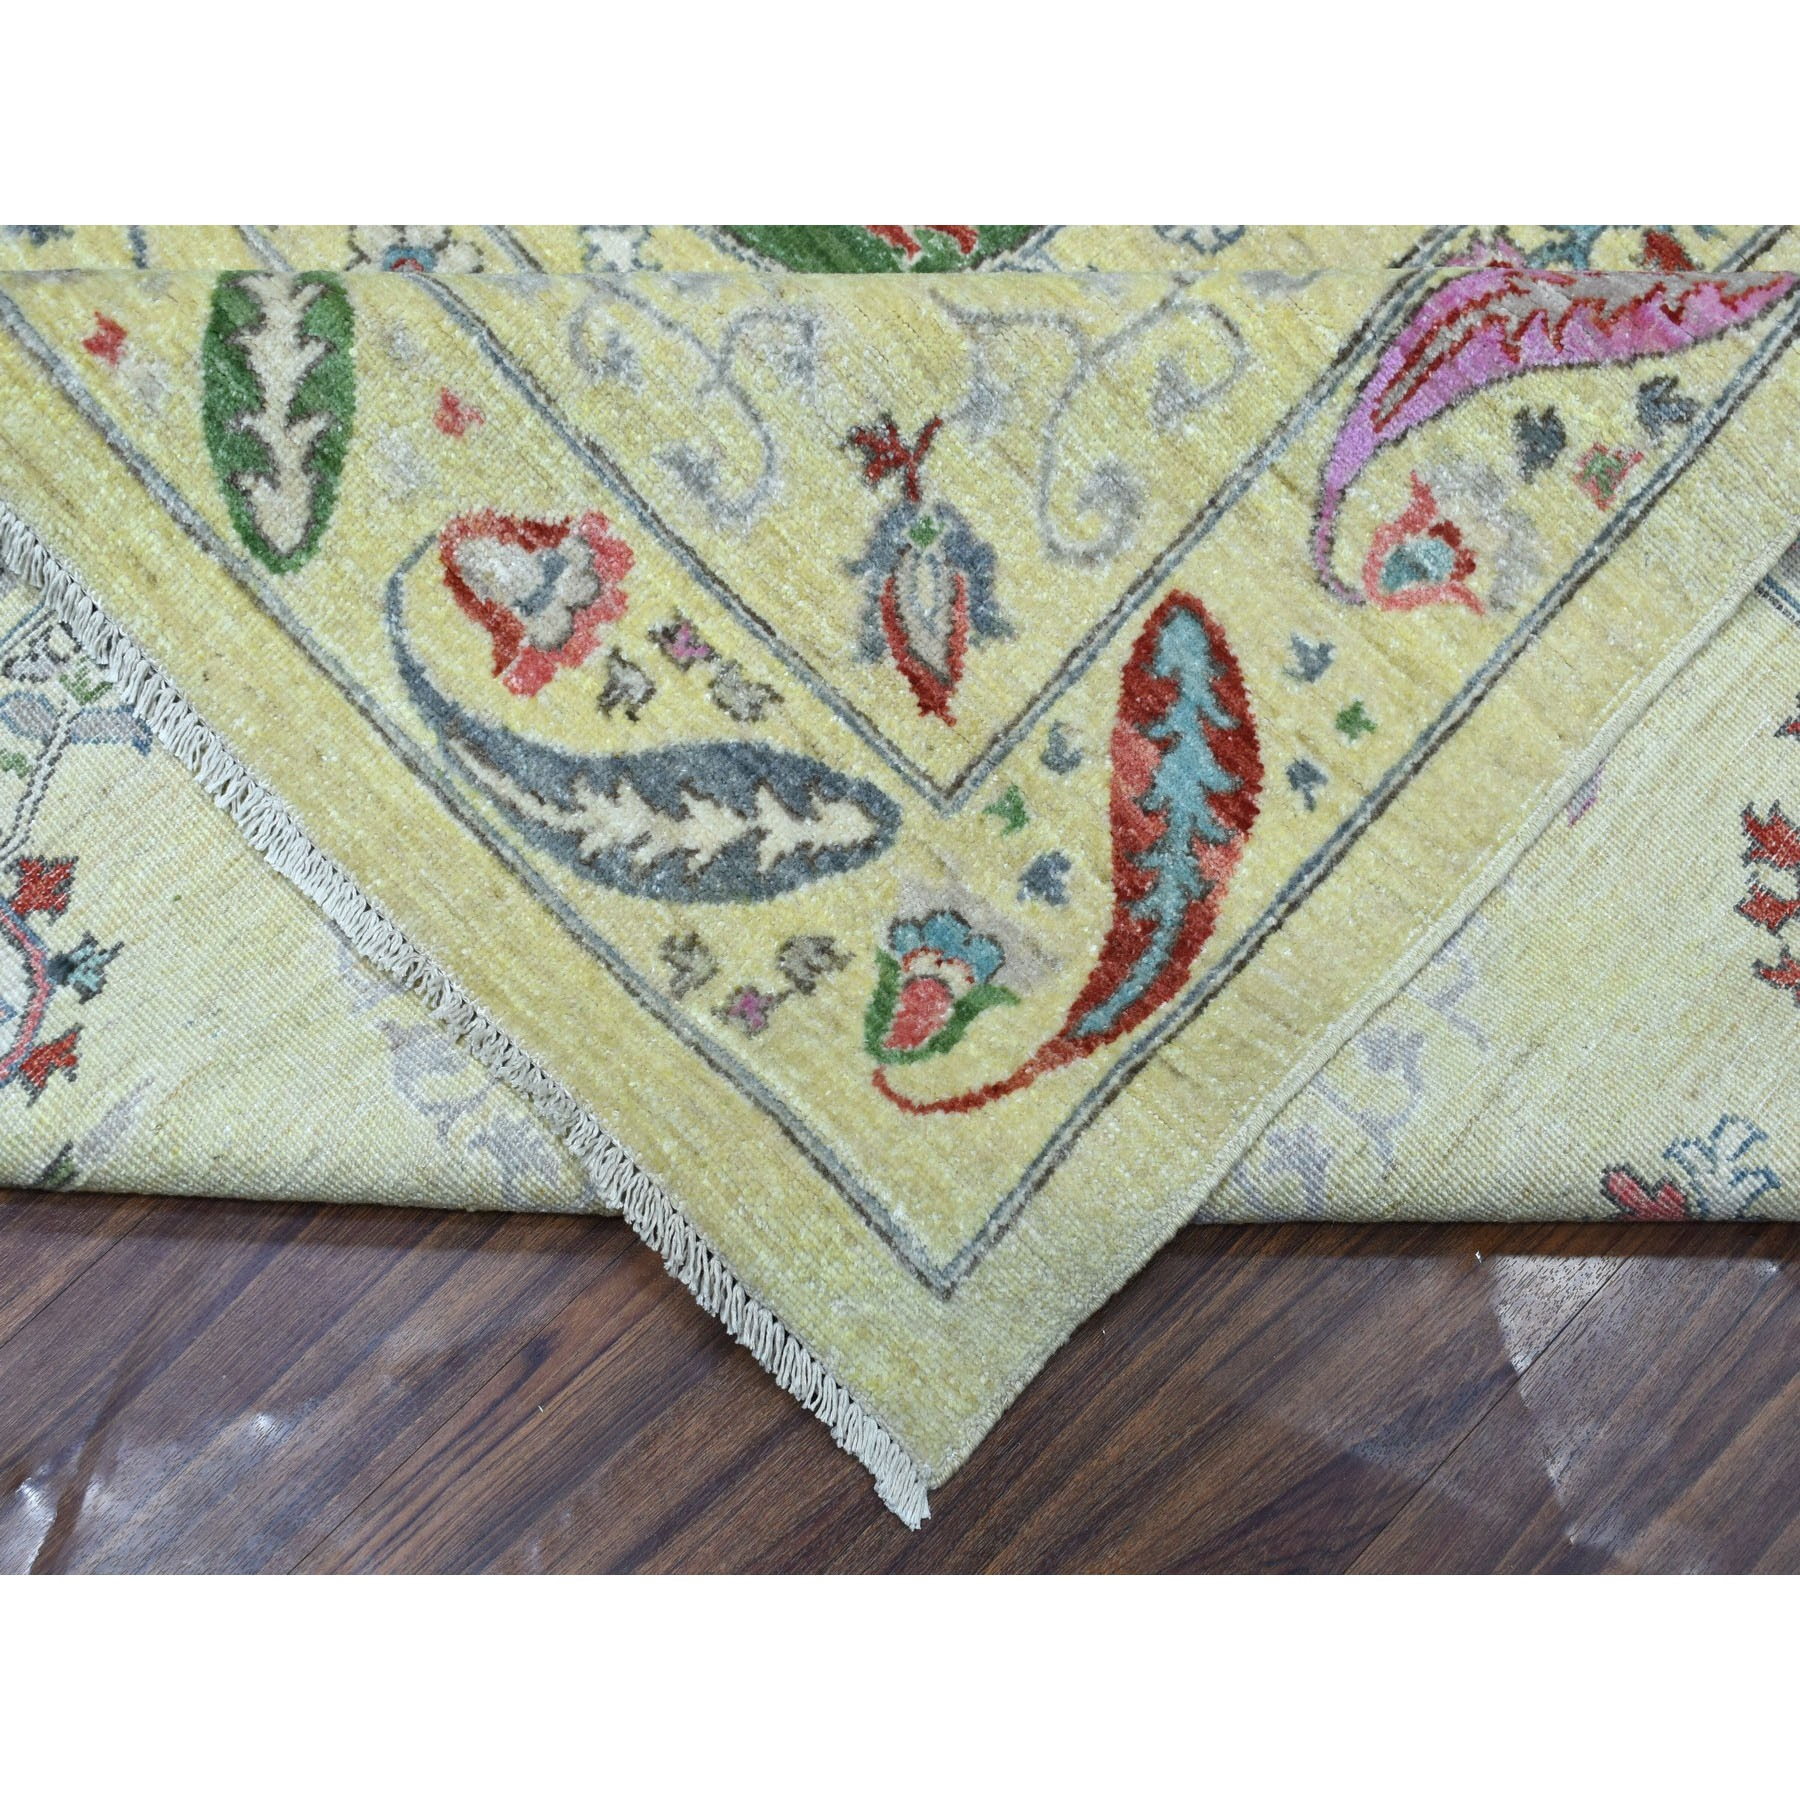 "9'x11'10"" Yellow Peshawar With Suzani Uzbek Design Hand Knotted Oriental Rug"